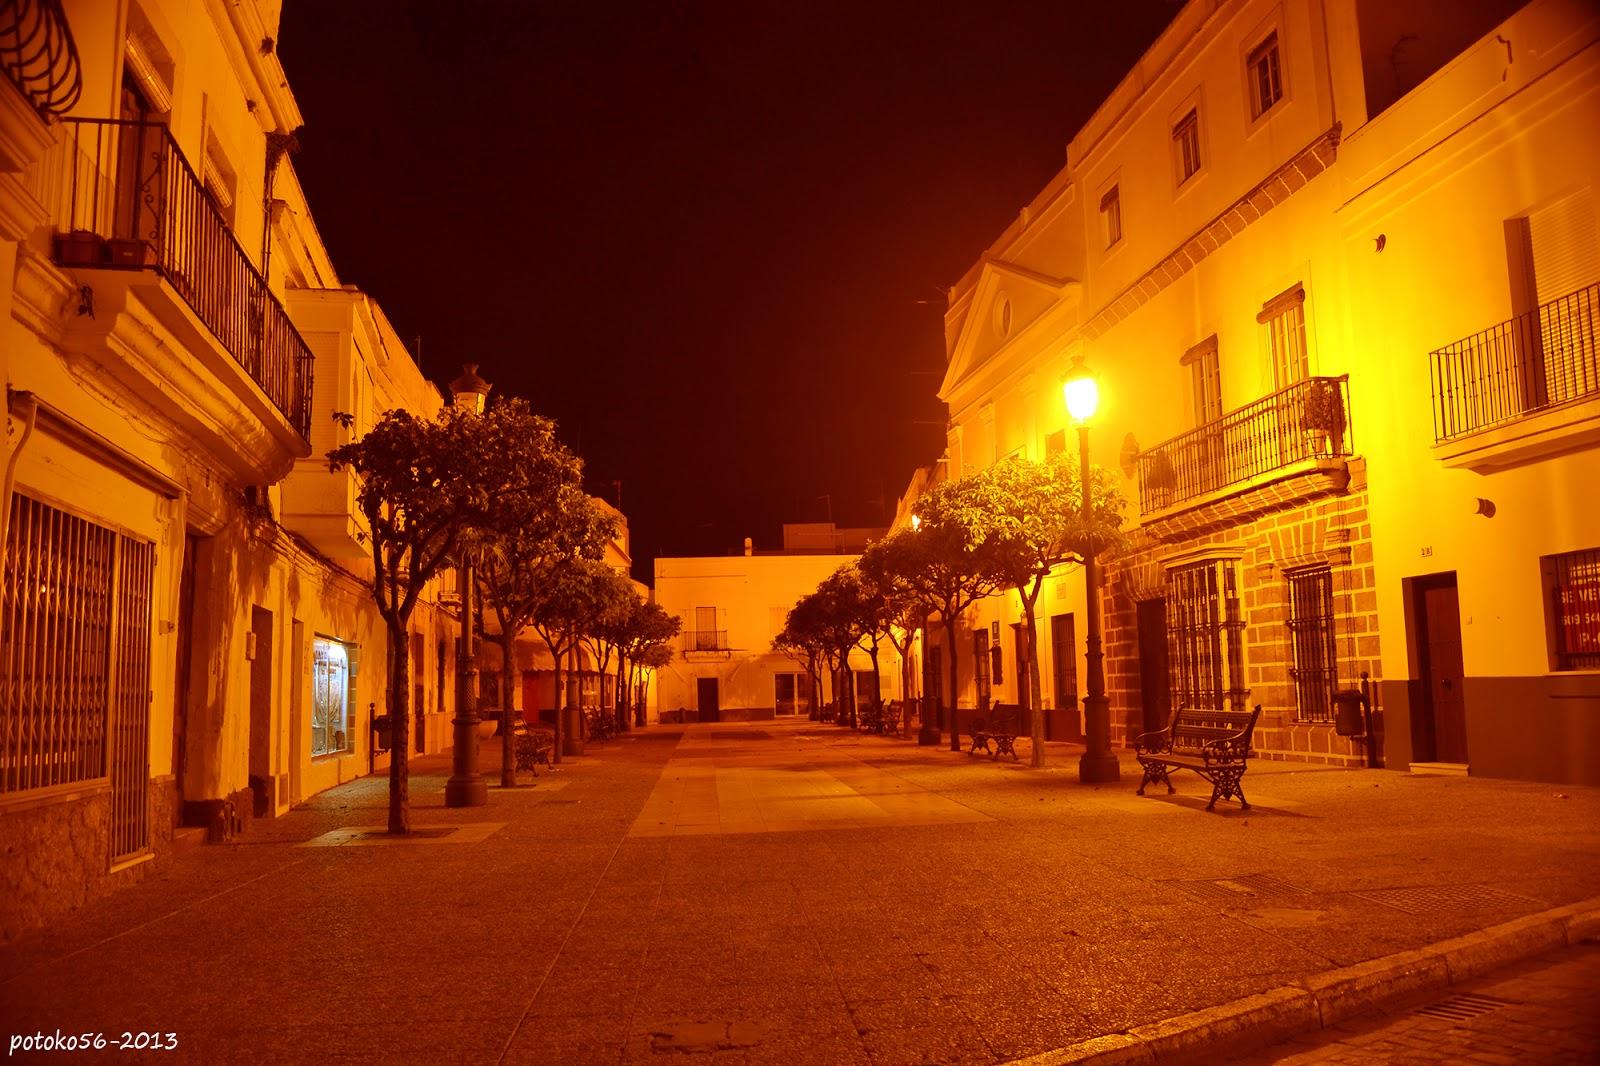 Plaza Barroso en Rota vista de noche